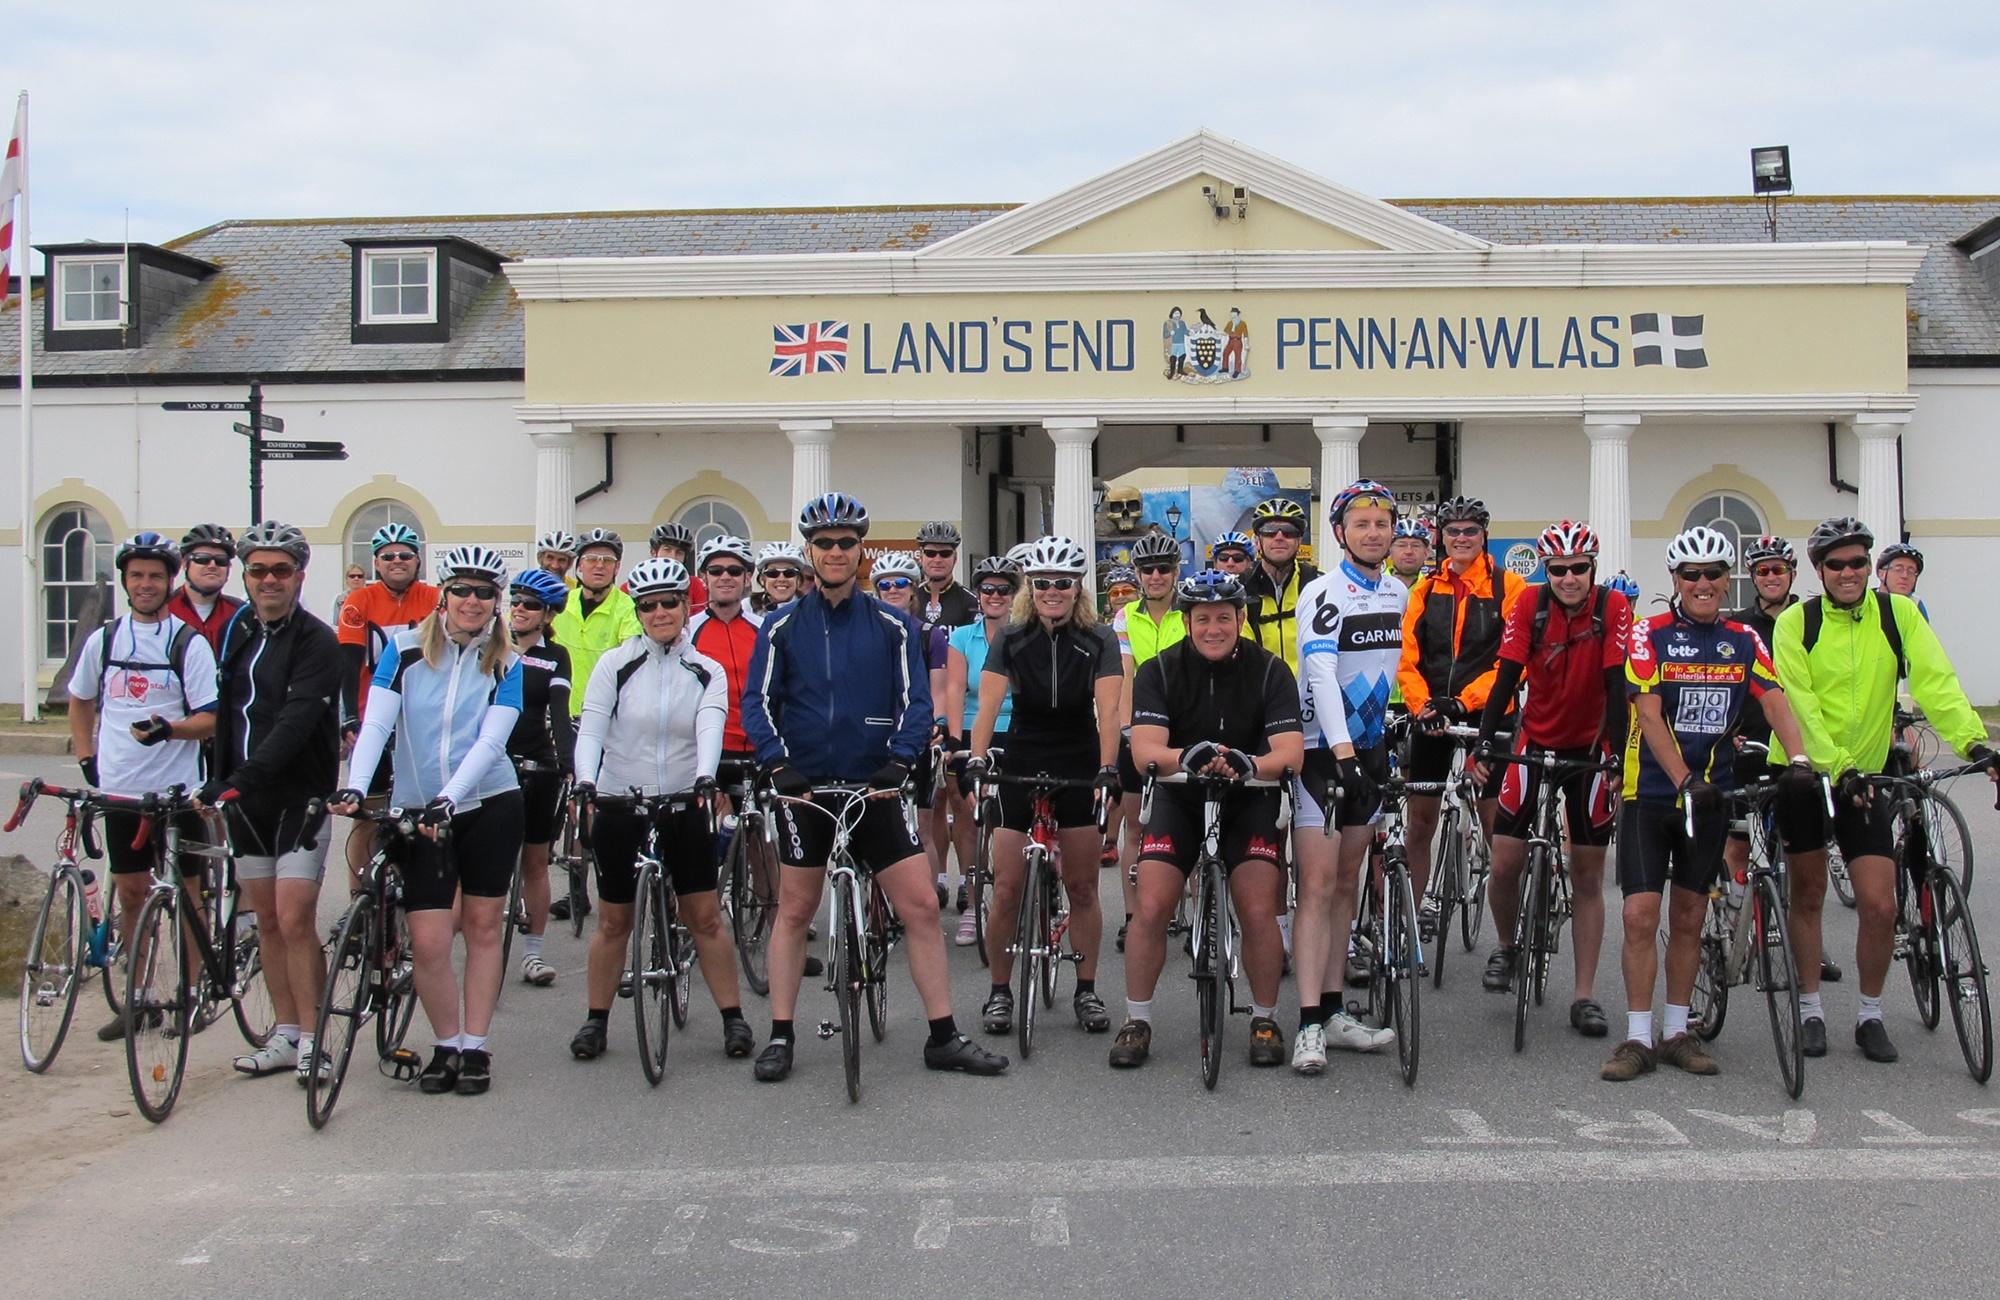 Lands_End_charity_bike_ride_start.jpg